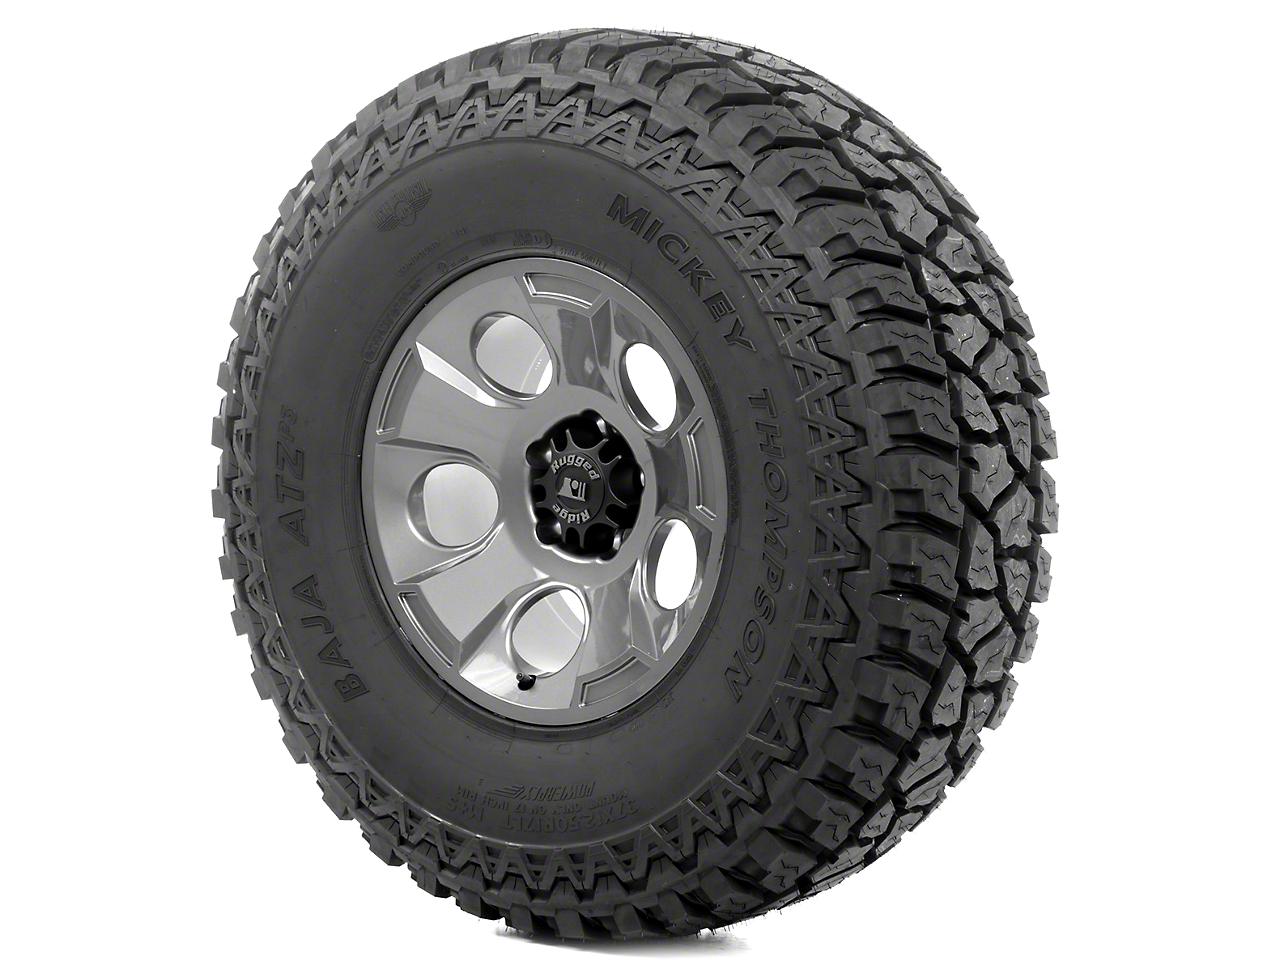 Rugged Ridge Drakon Wheel 17x9 Gun Metal and Mickey Thompson ATZ P3 37x12.50x17 Tire Kit (13-18 Jeep Wrangler JK; 2018 Jeep Wrangler JL)